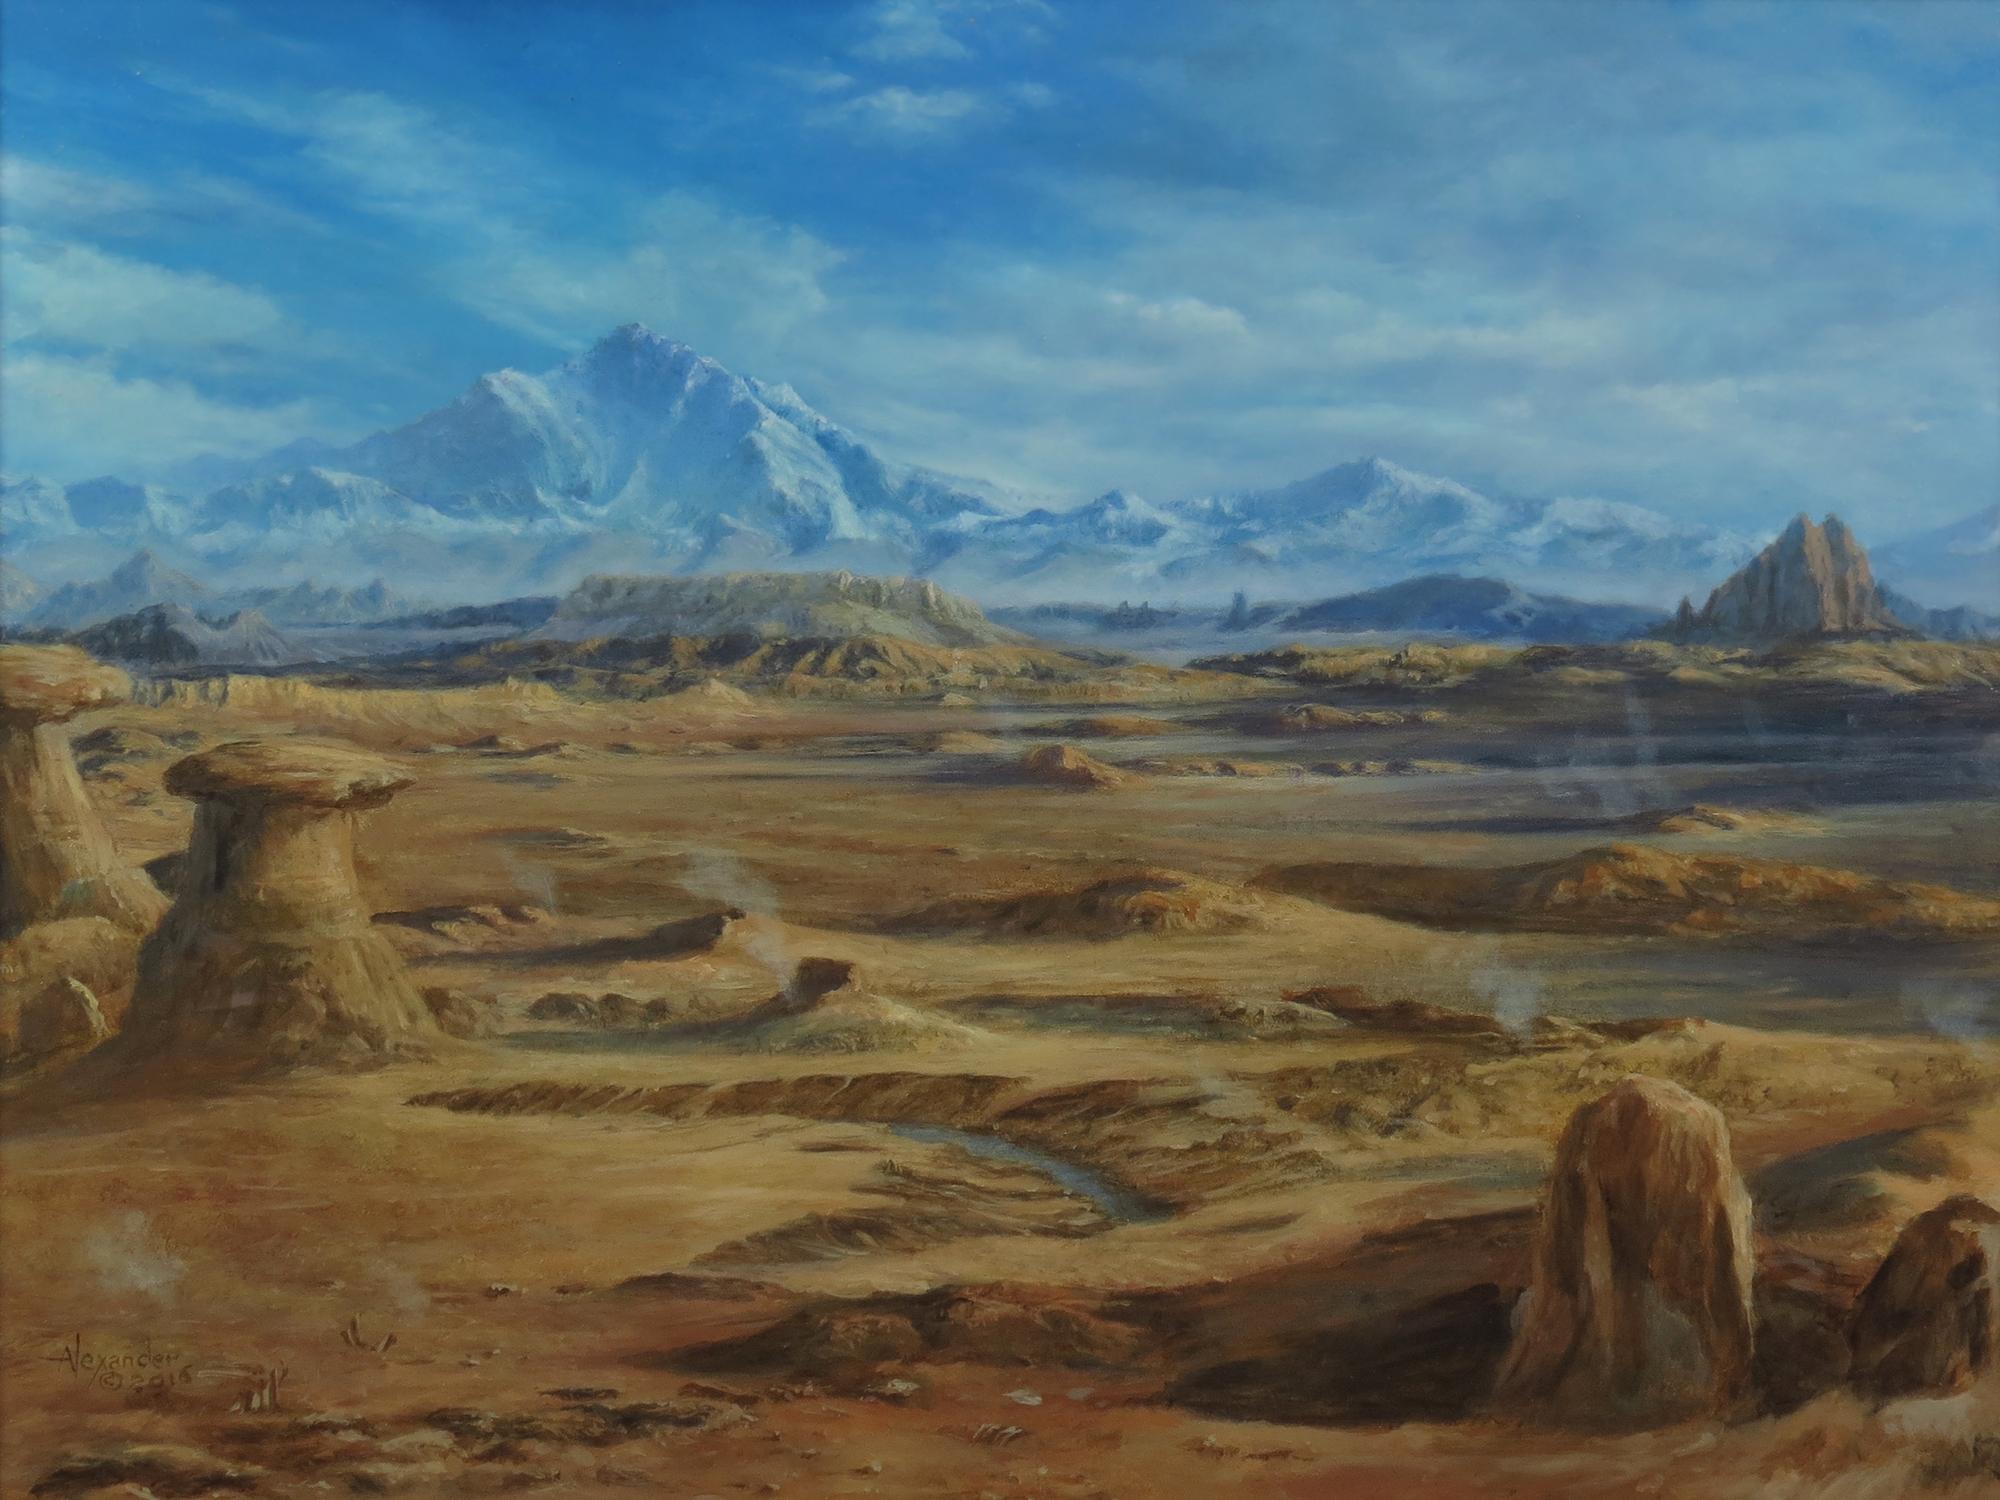 The Desolation Artwork by Rob Alexander